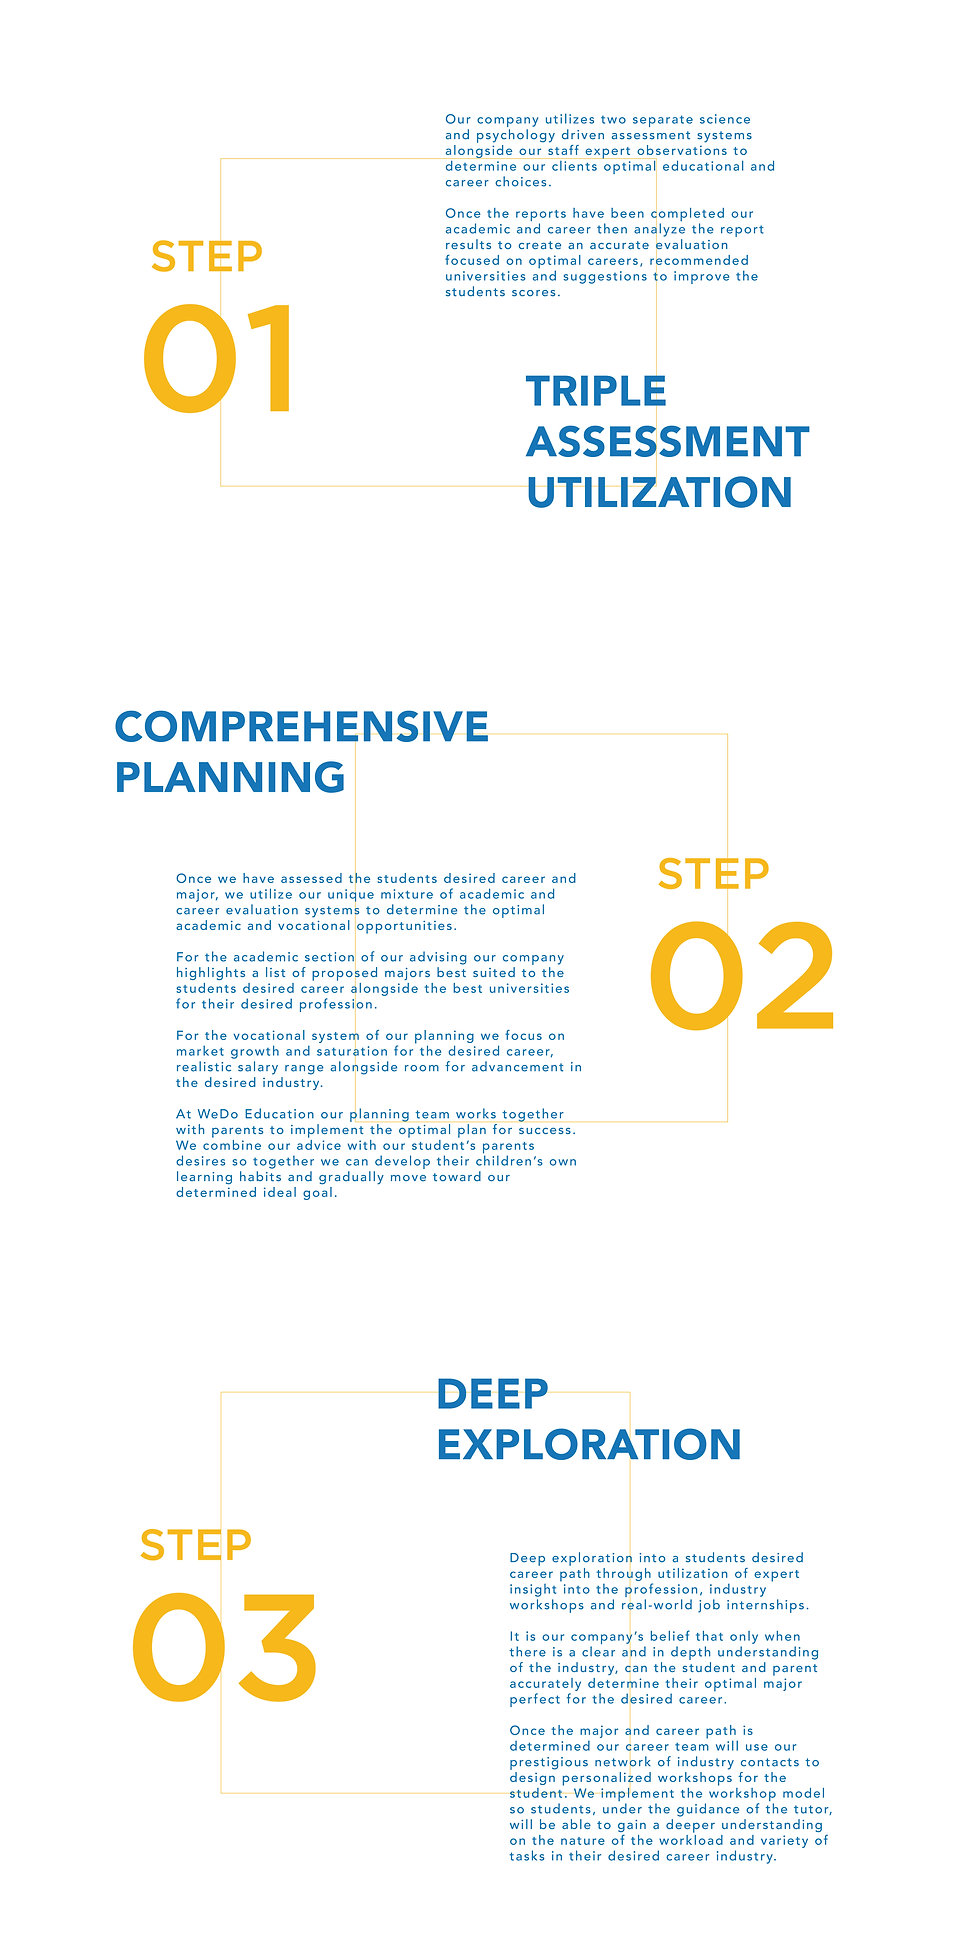 planing-02.jpg